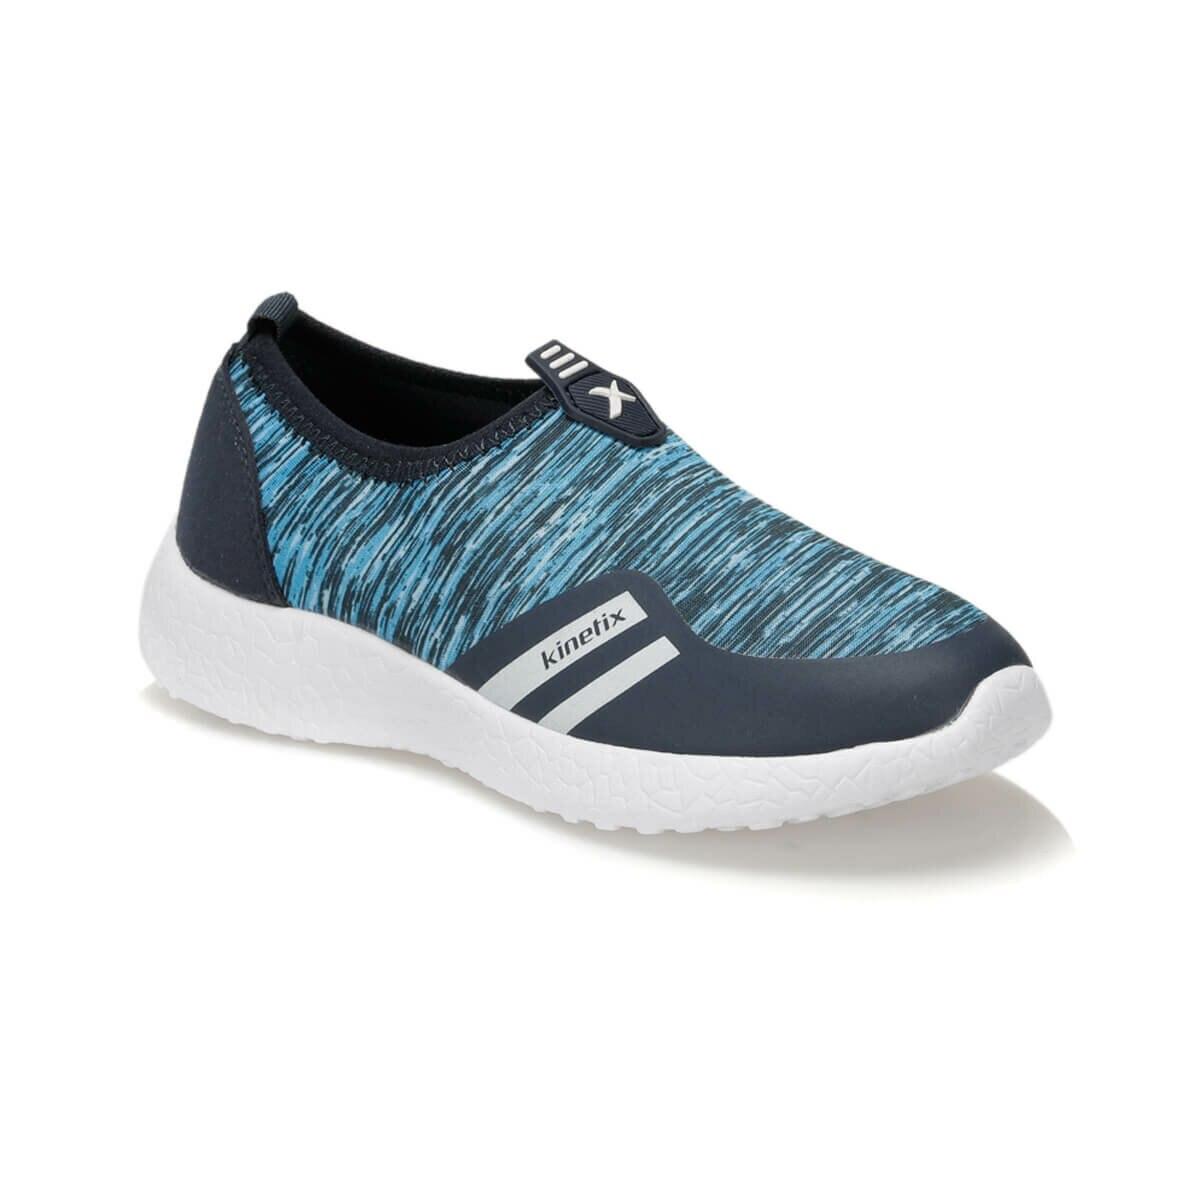 FLO AGNAR Blue Male Child Hiking Shoes KINETIX